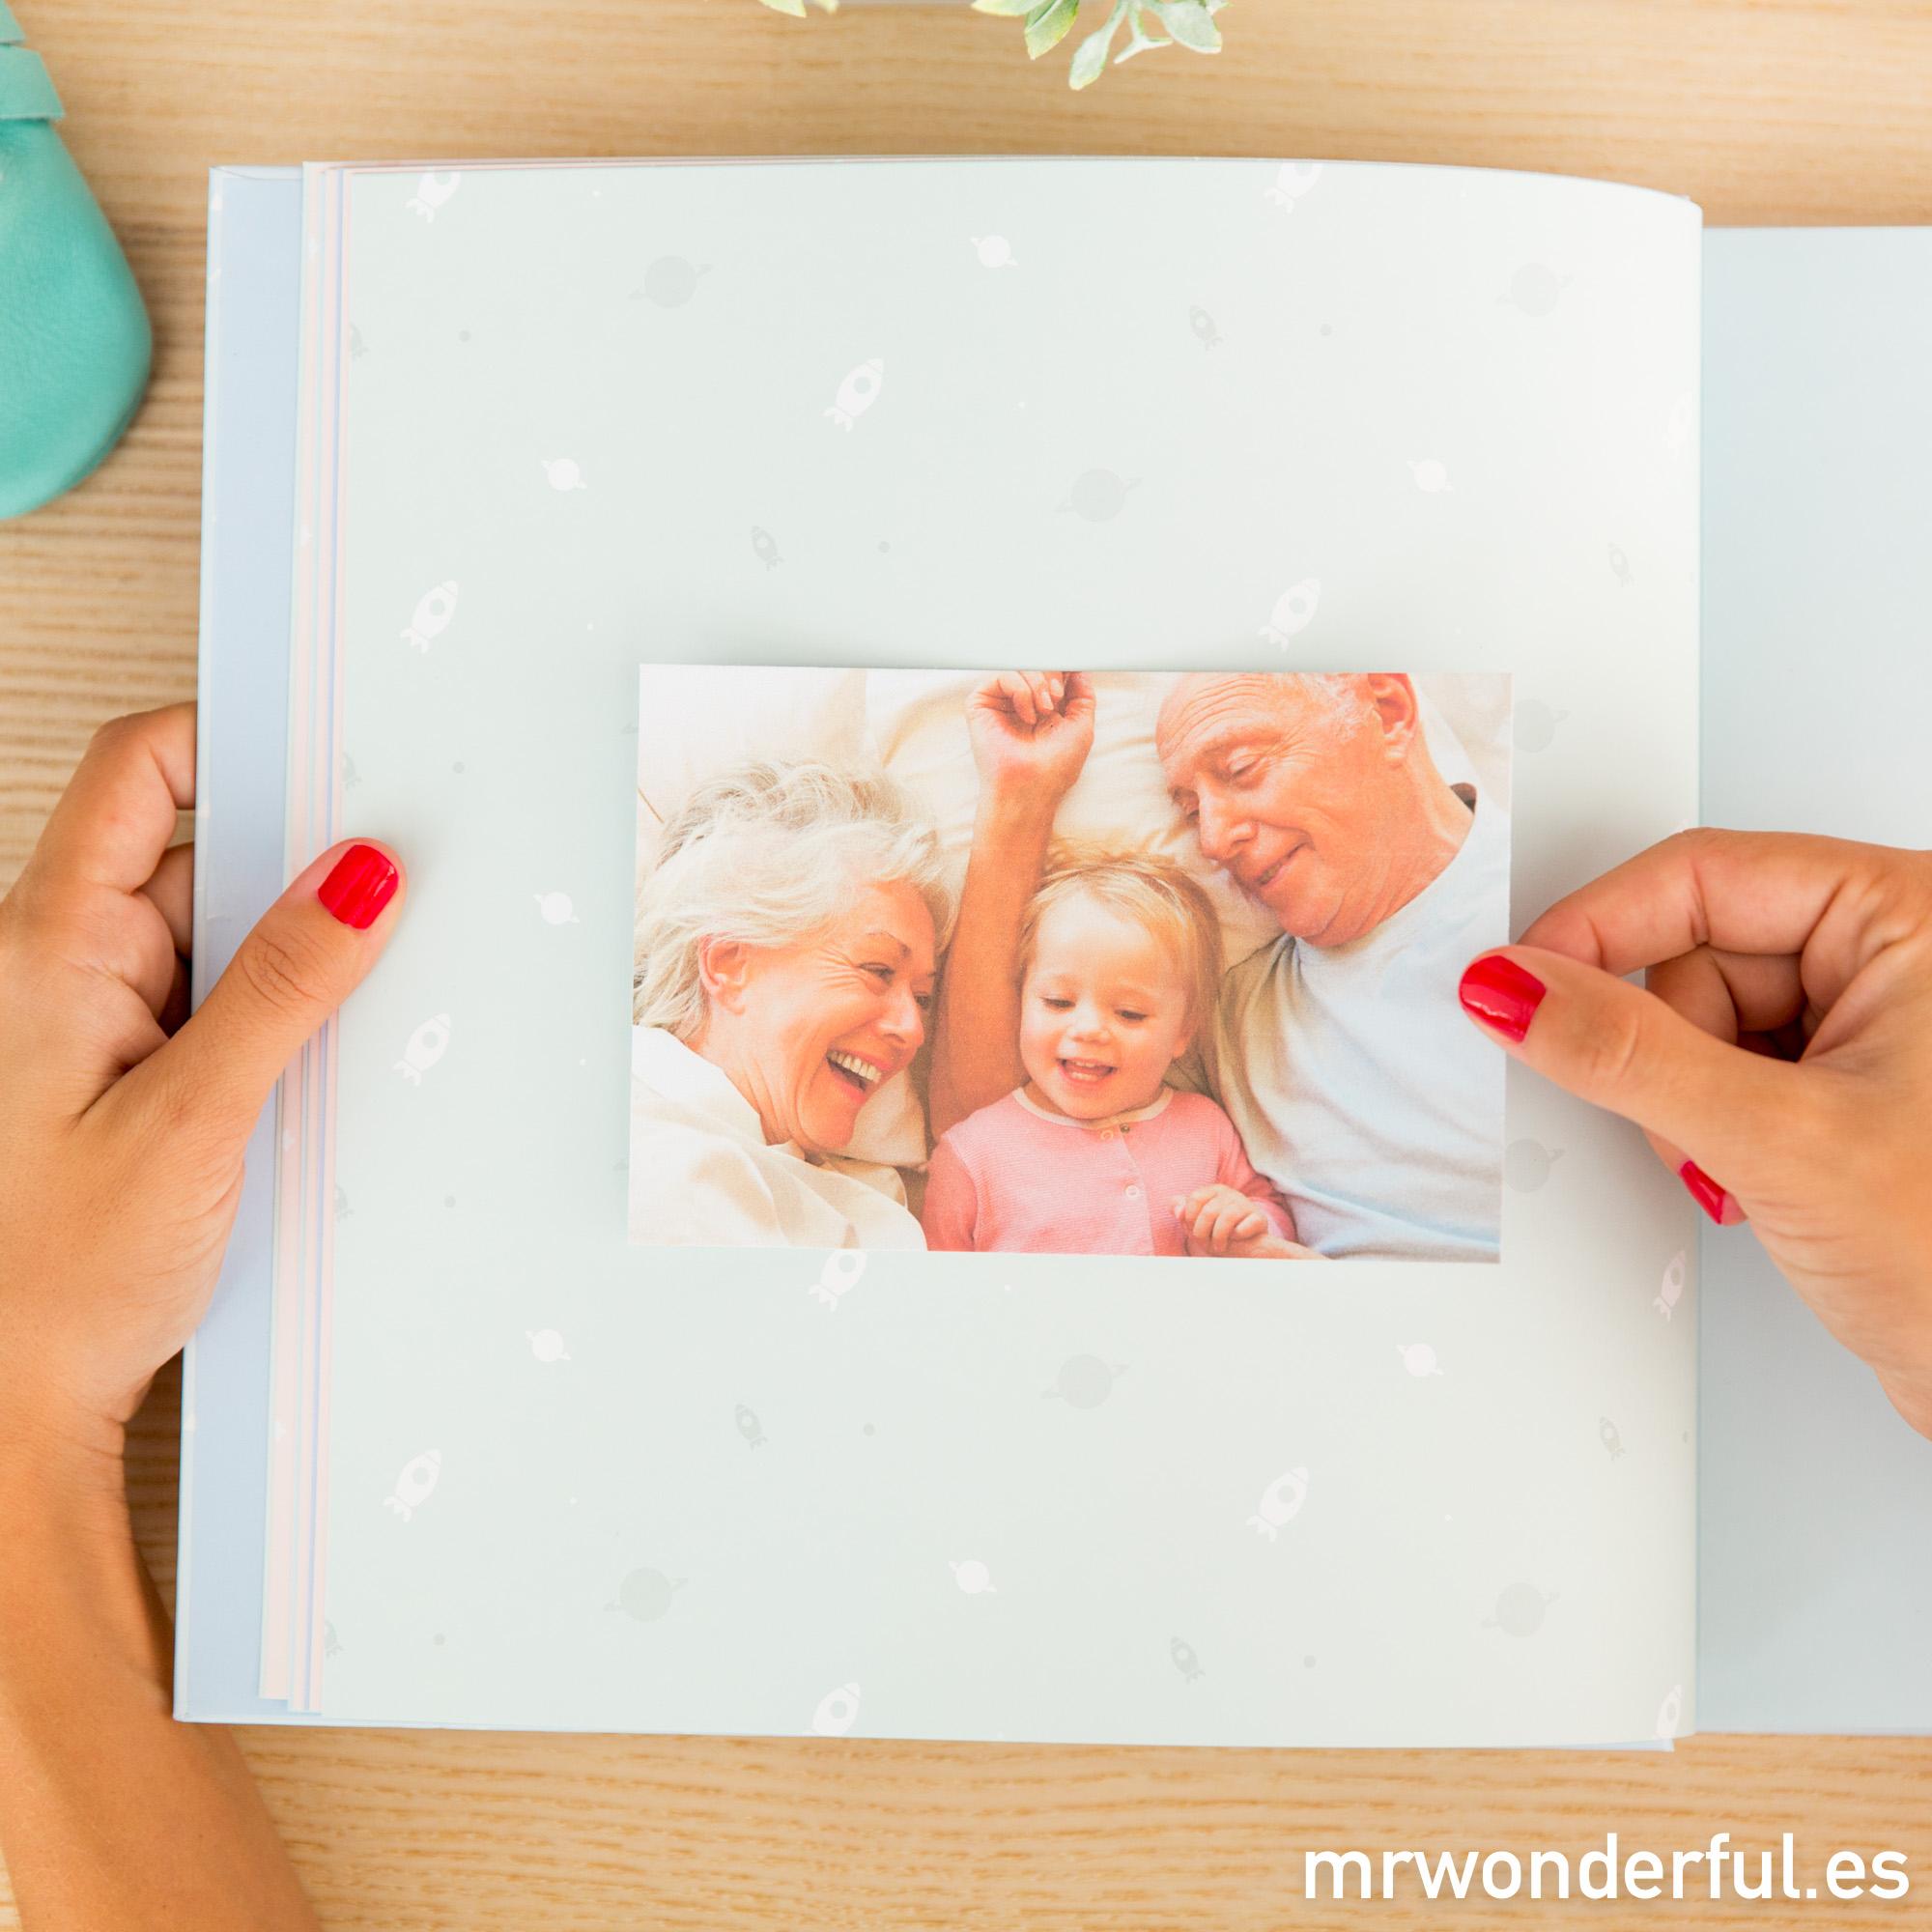 mrwonderful_8435460709828_album_infantil_Nuestros-recuerdos-ES-13-Editar